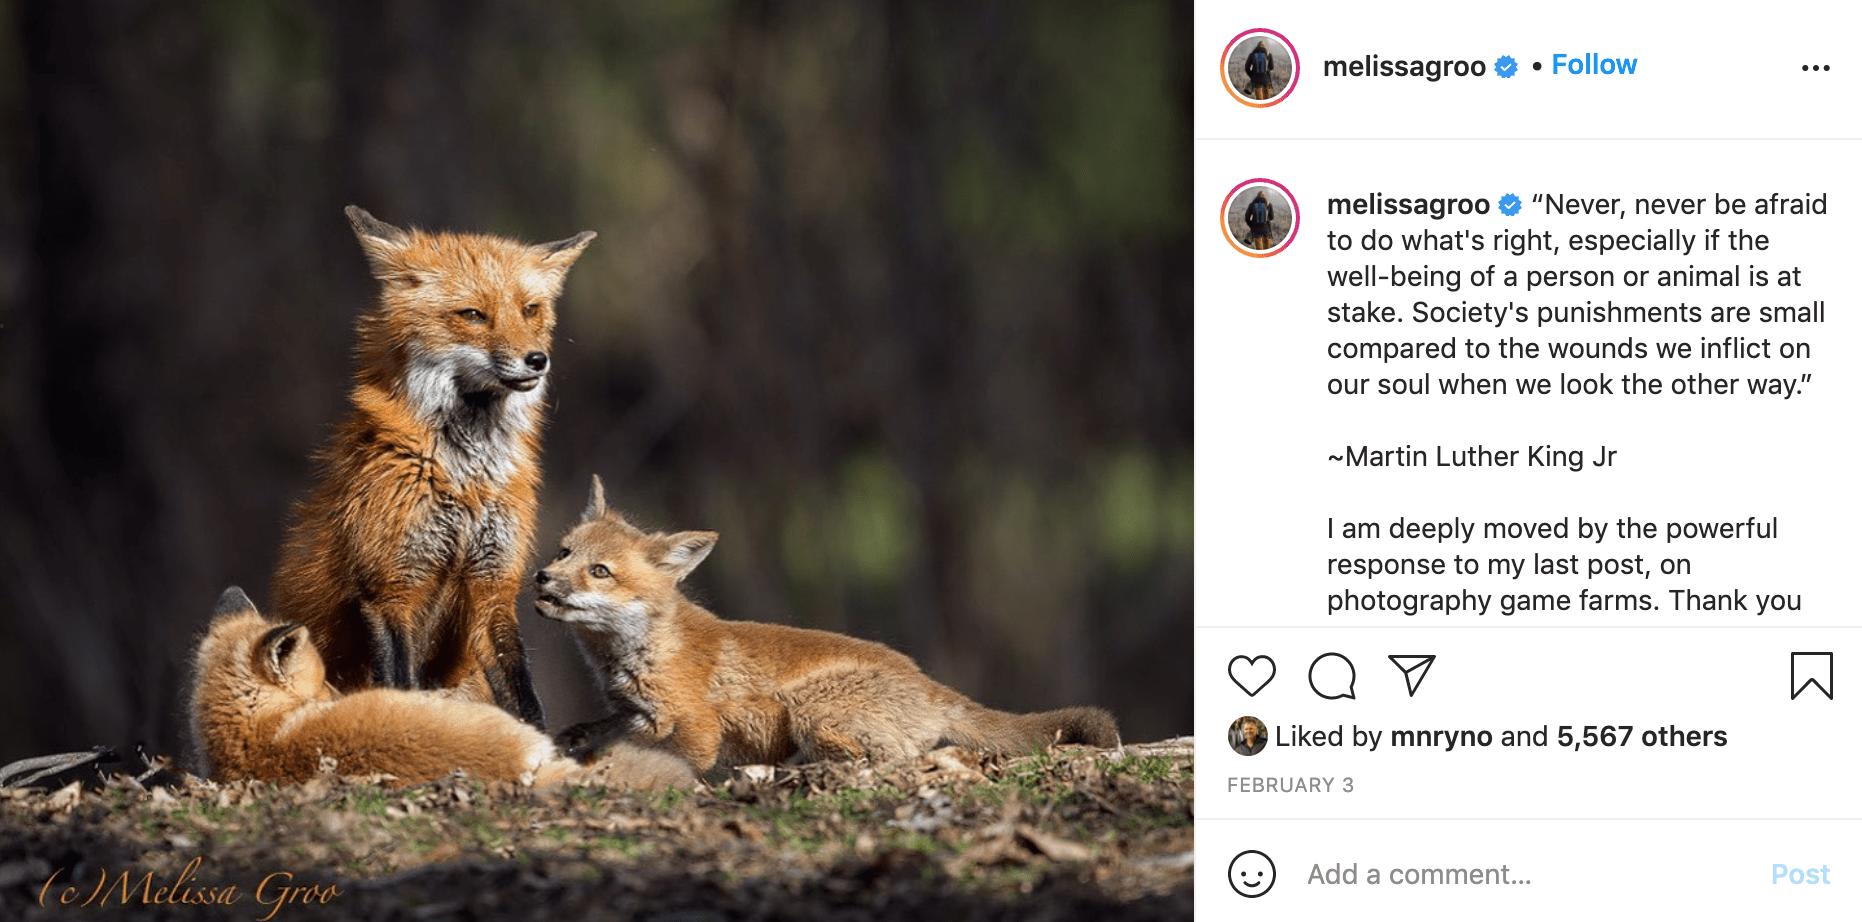 Follow Wildlife Conservation Photographer - Melissa Groo